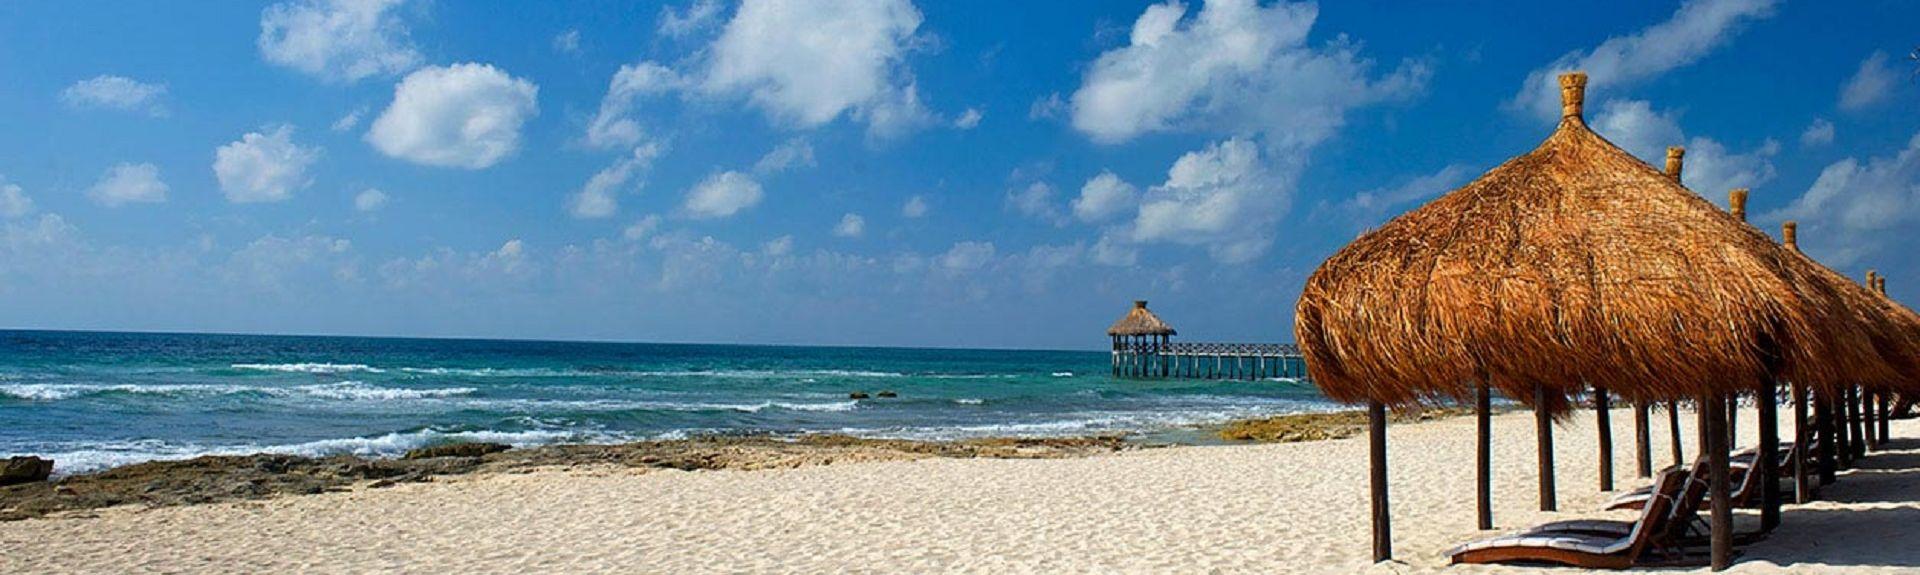 Grand Luxxe Riviera Maya (Quintana Roo, Mexiko)